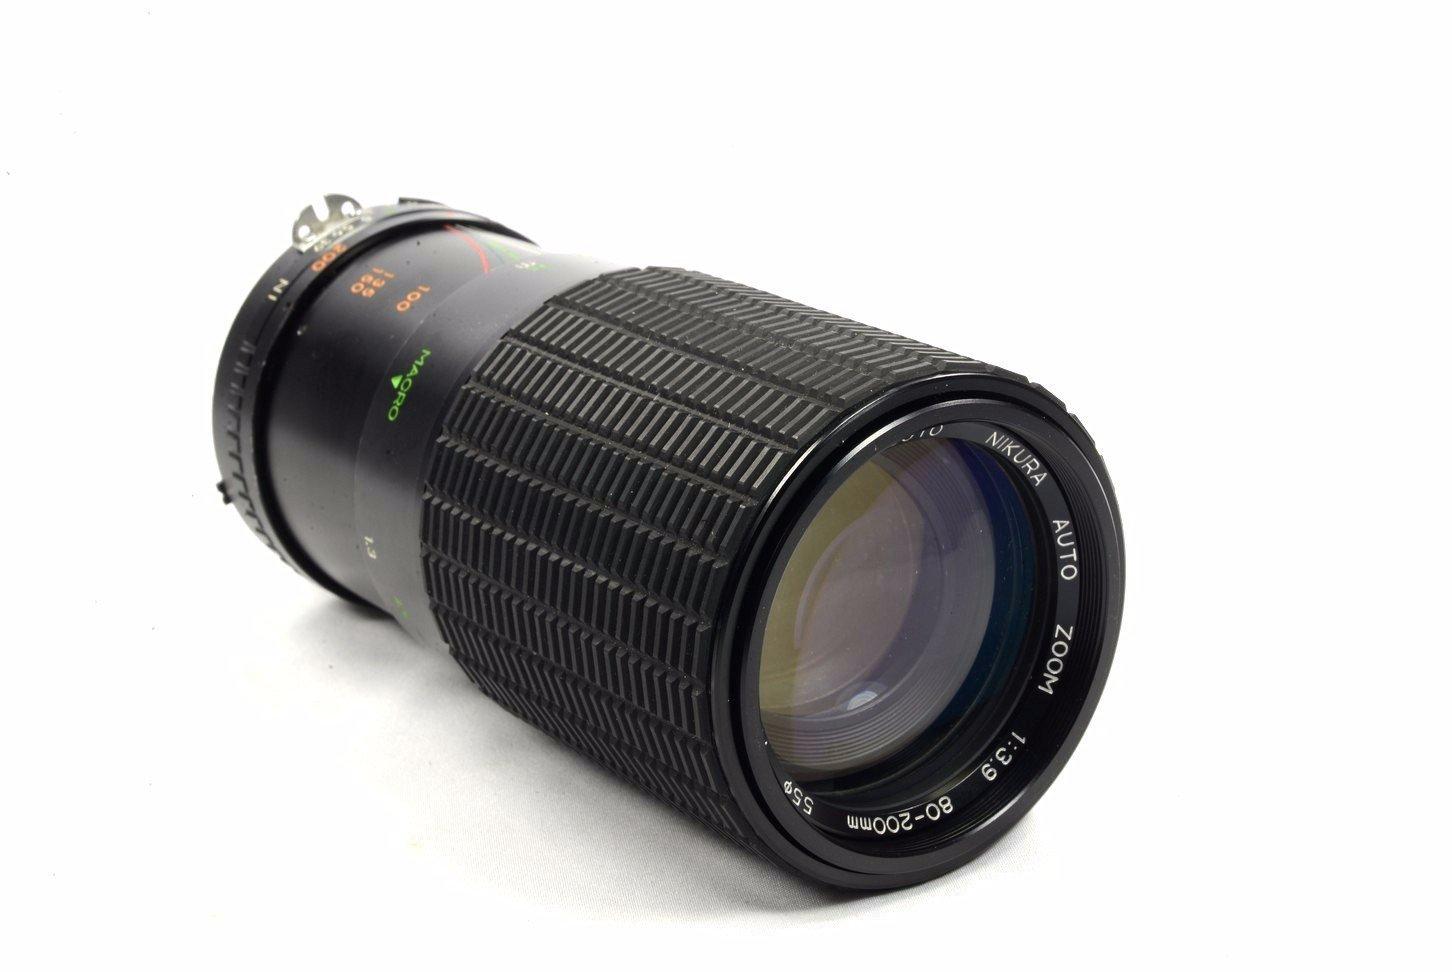 Nikura 80 200mm F 39 Nikon Manual Focus Lens Camera Parts Diagram Where To Get For A D5000 Slr Photo